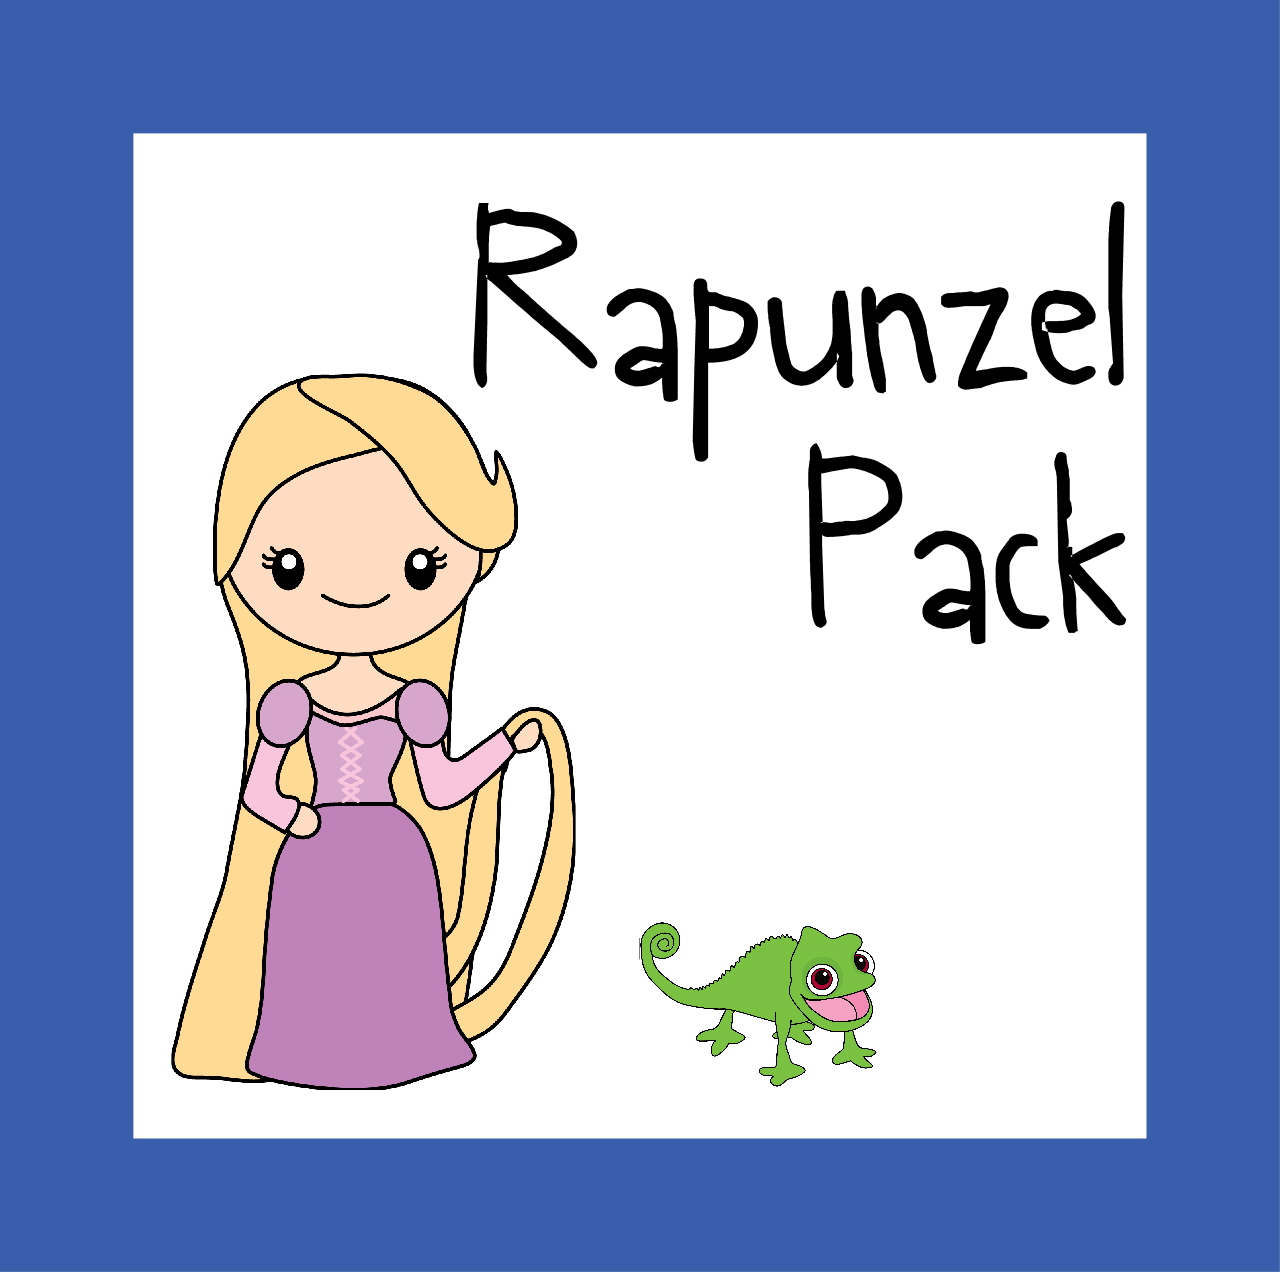 Free R Punzel W Ksheets Kids